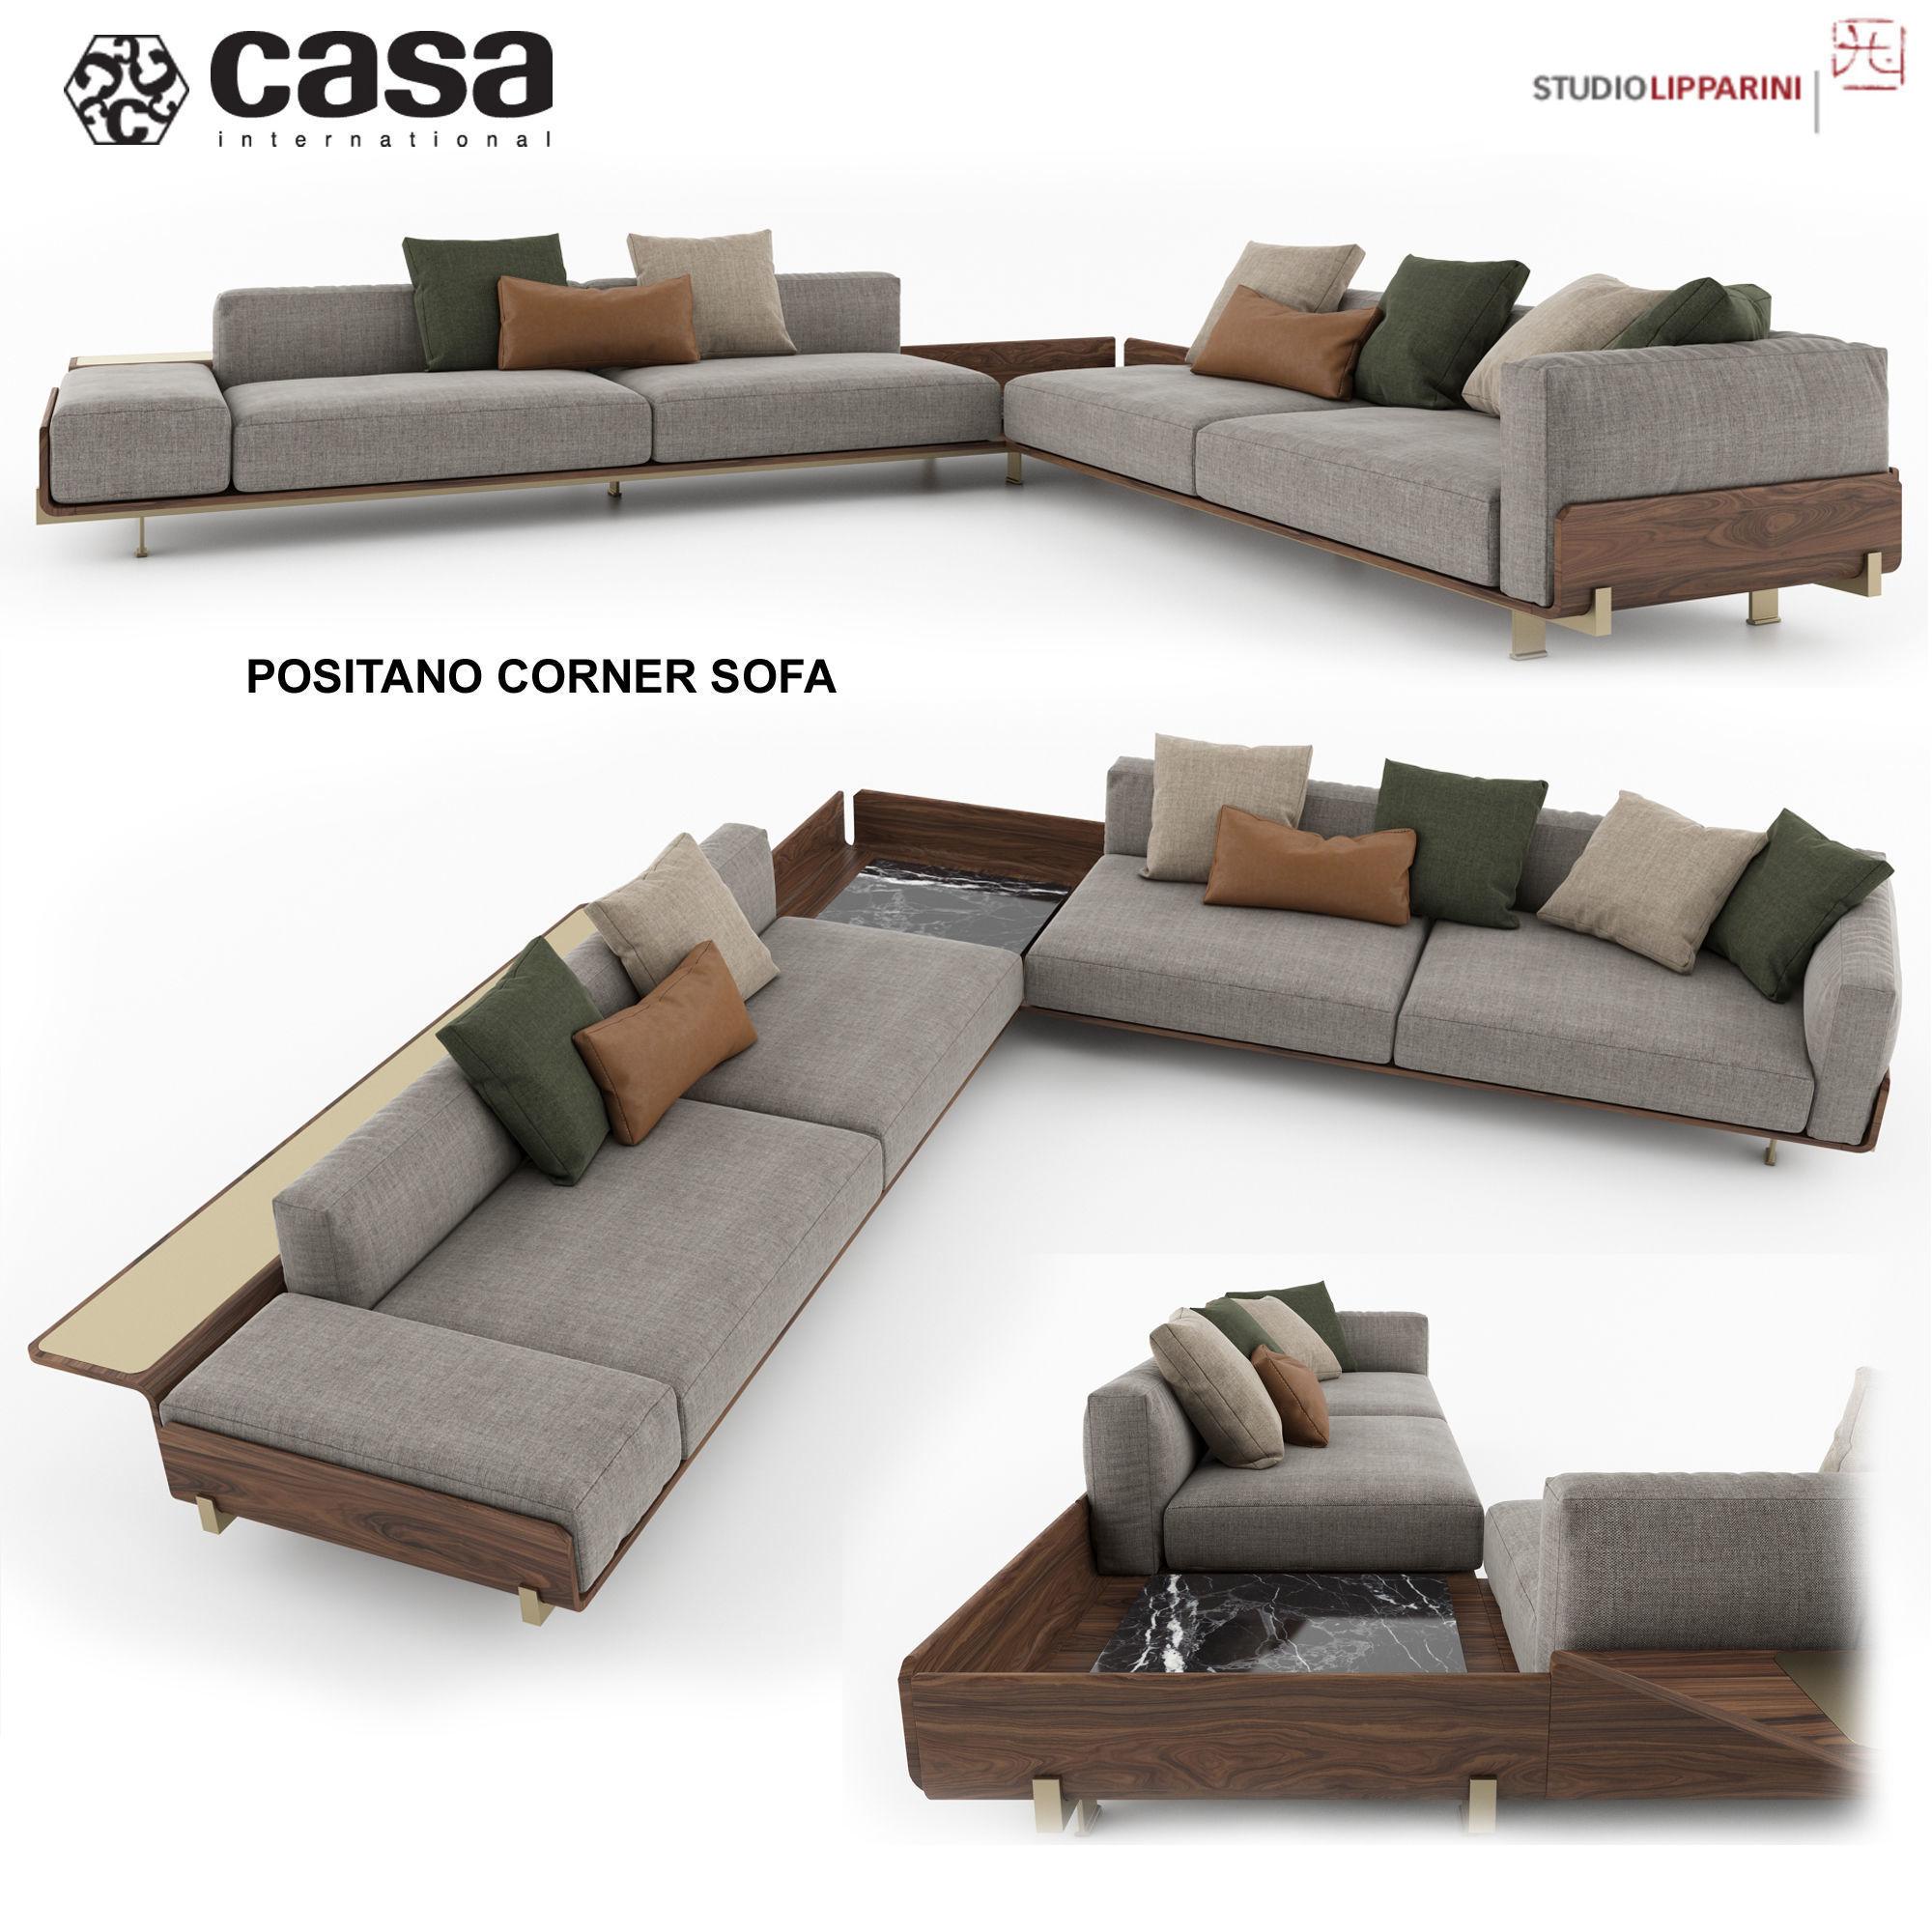 Casa Intl Positano Corner Sofa 3d Model Max Obj 1 ...